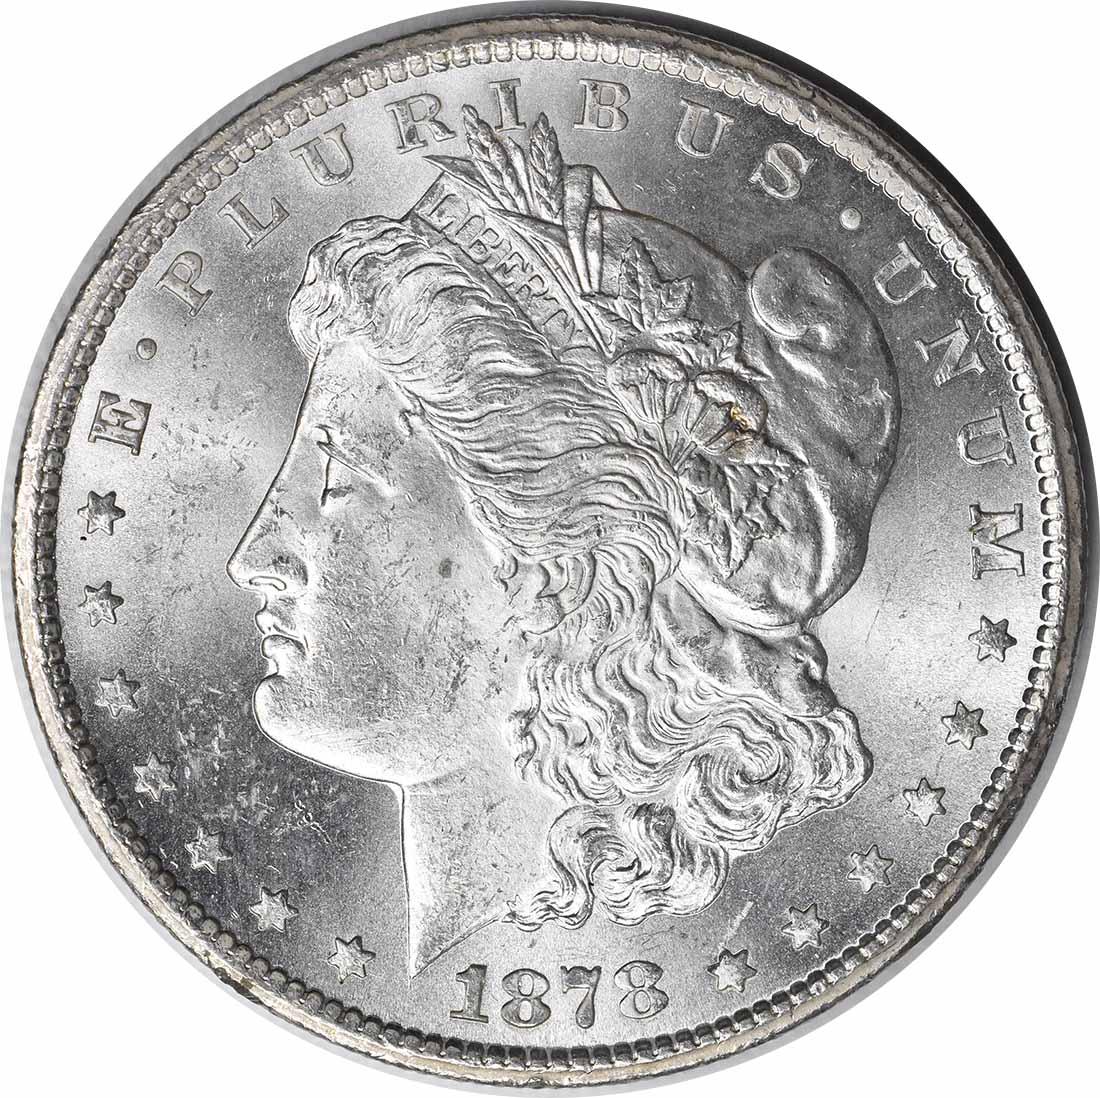 1878-CC Morgan Silver Dollar MS60 Uncertified #231